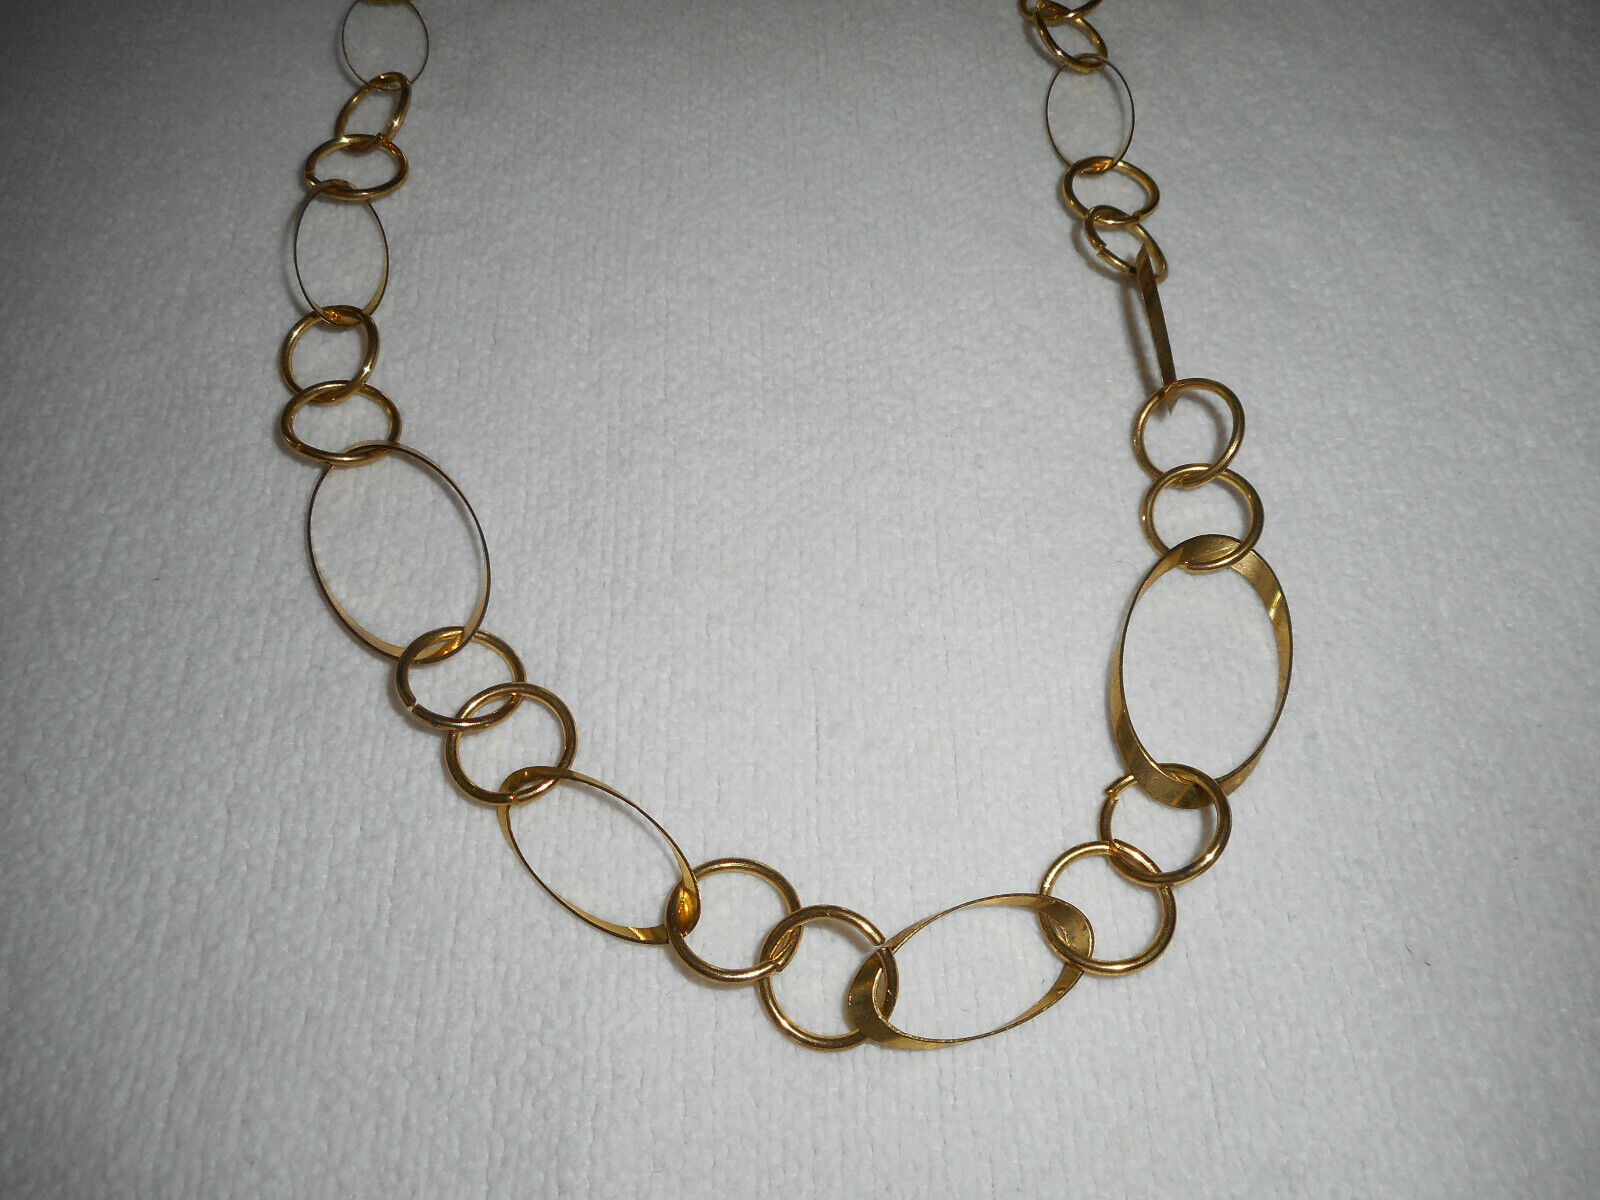 Modeschmuck  Wunderschöne Kette Gliederkette  lang  goldfarben 96cm  Shabby